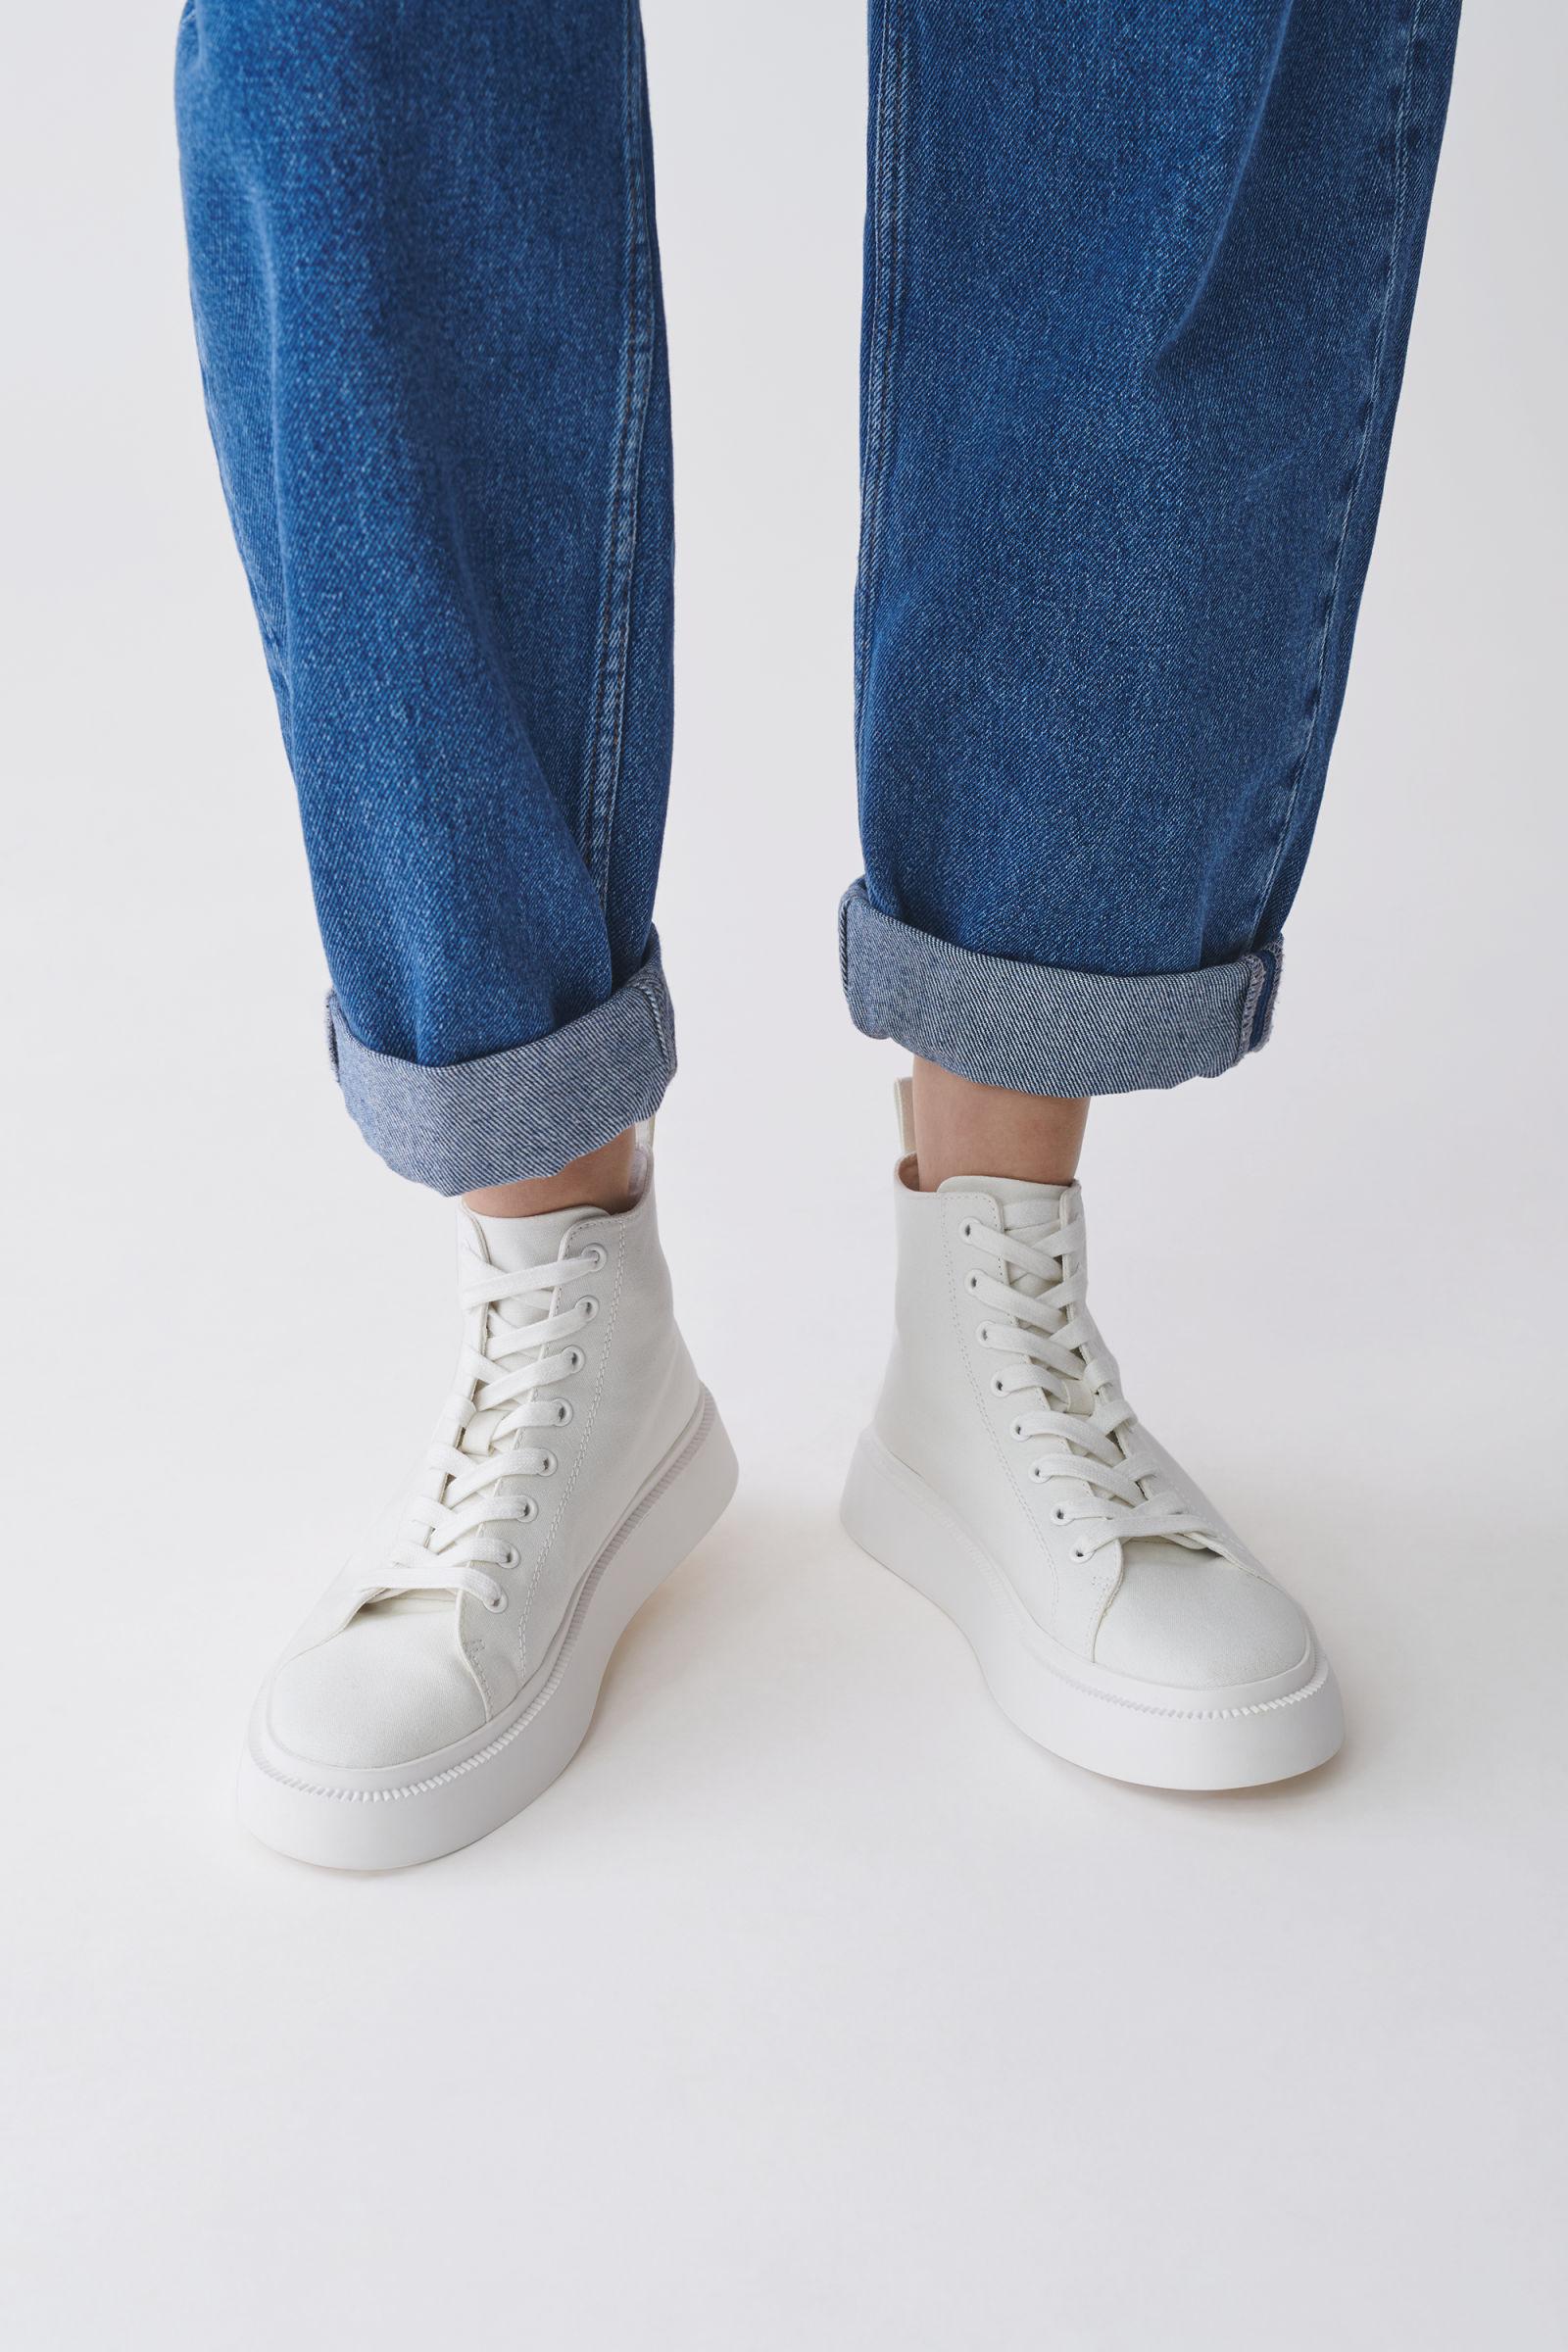 6. kép: COS sneaker